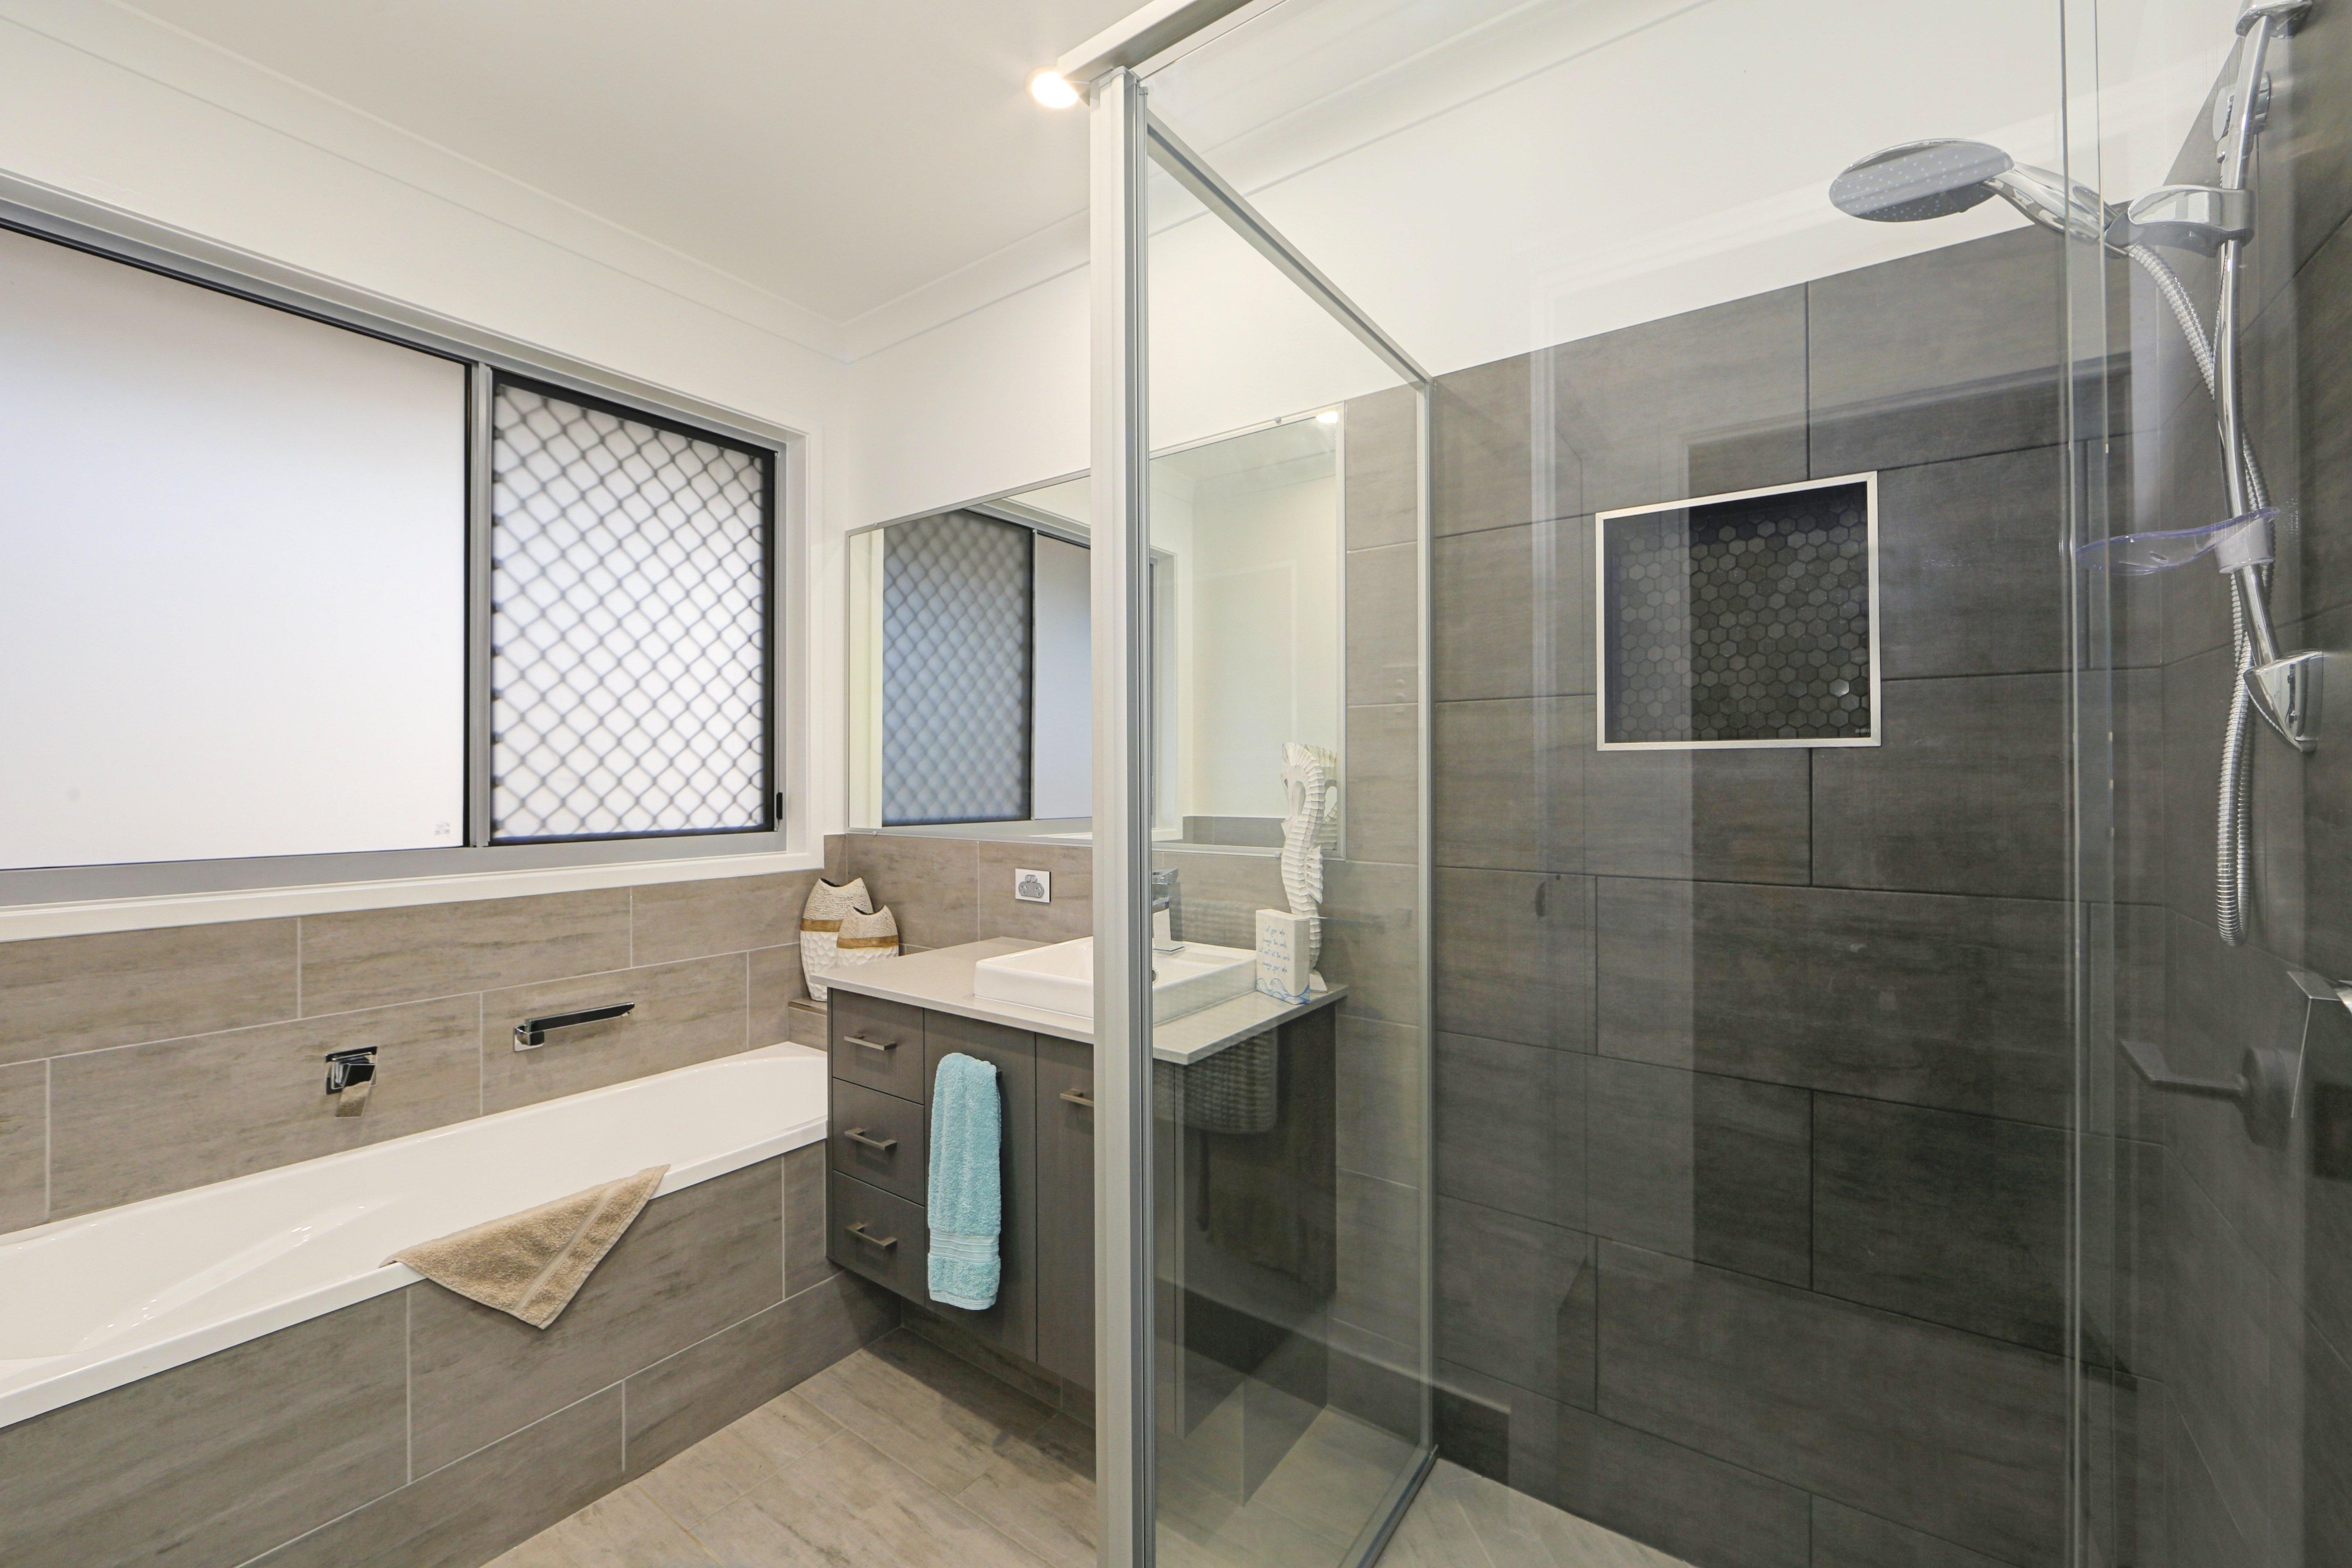 Standard Inclusion Bathroom 2